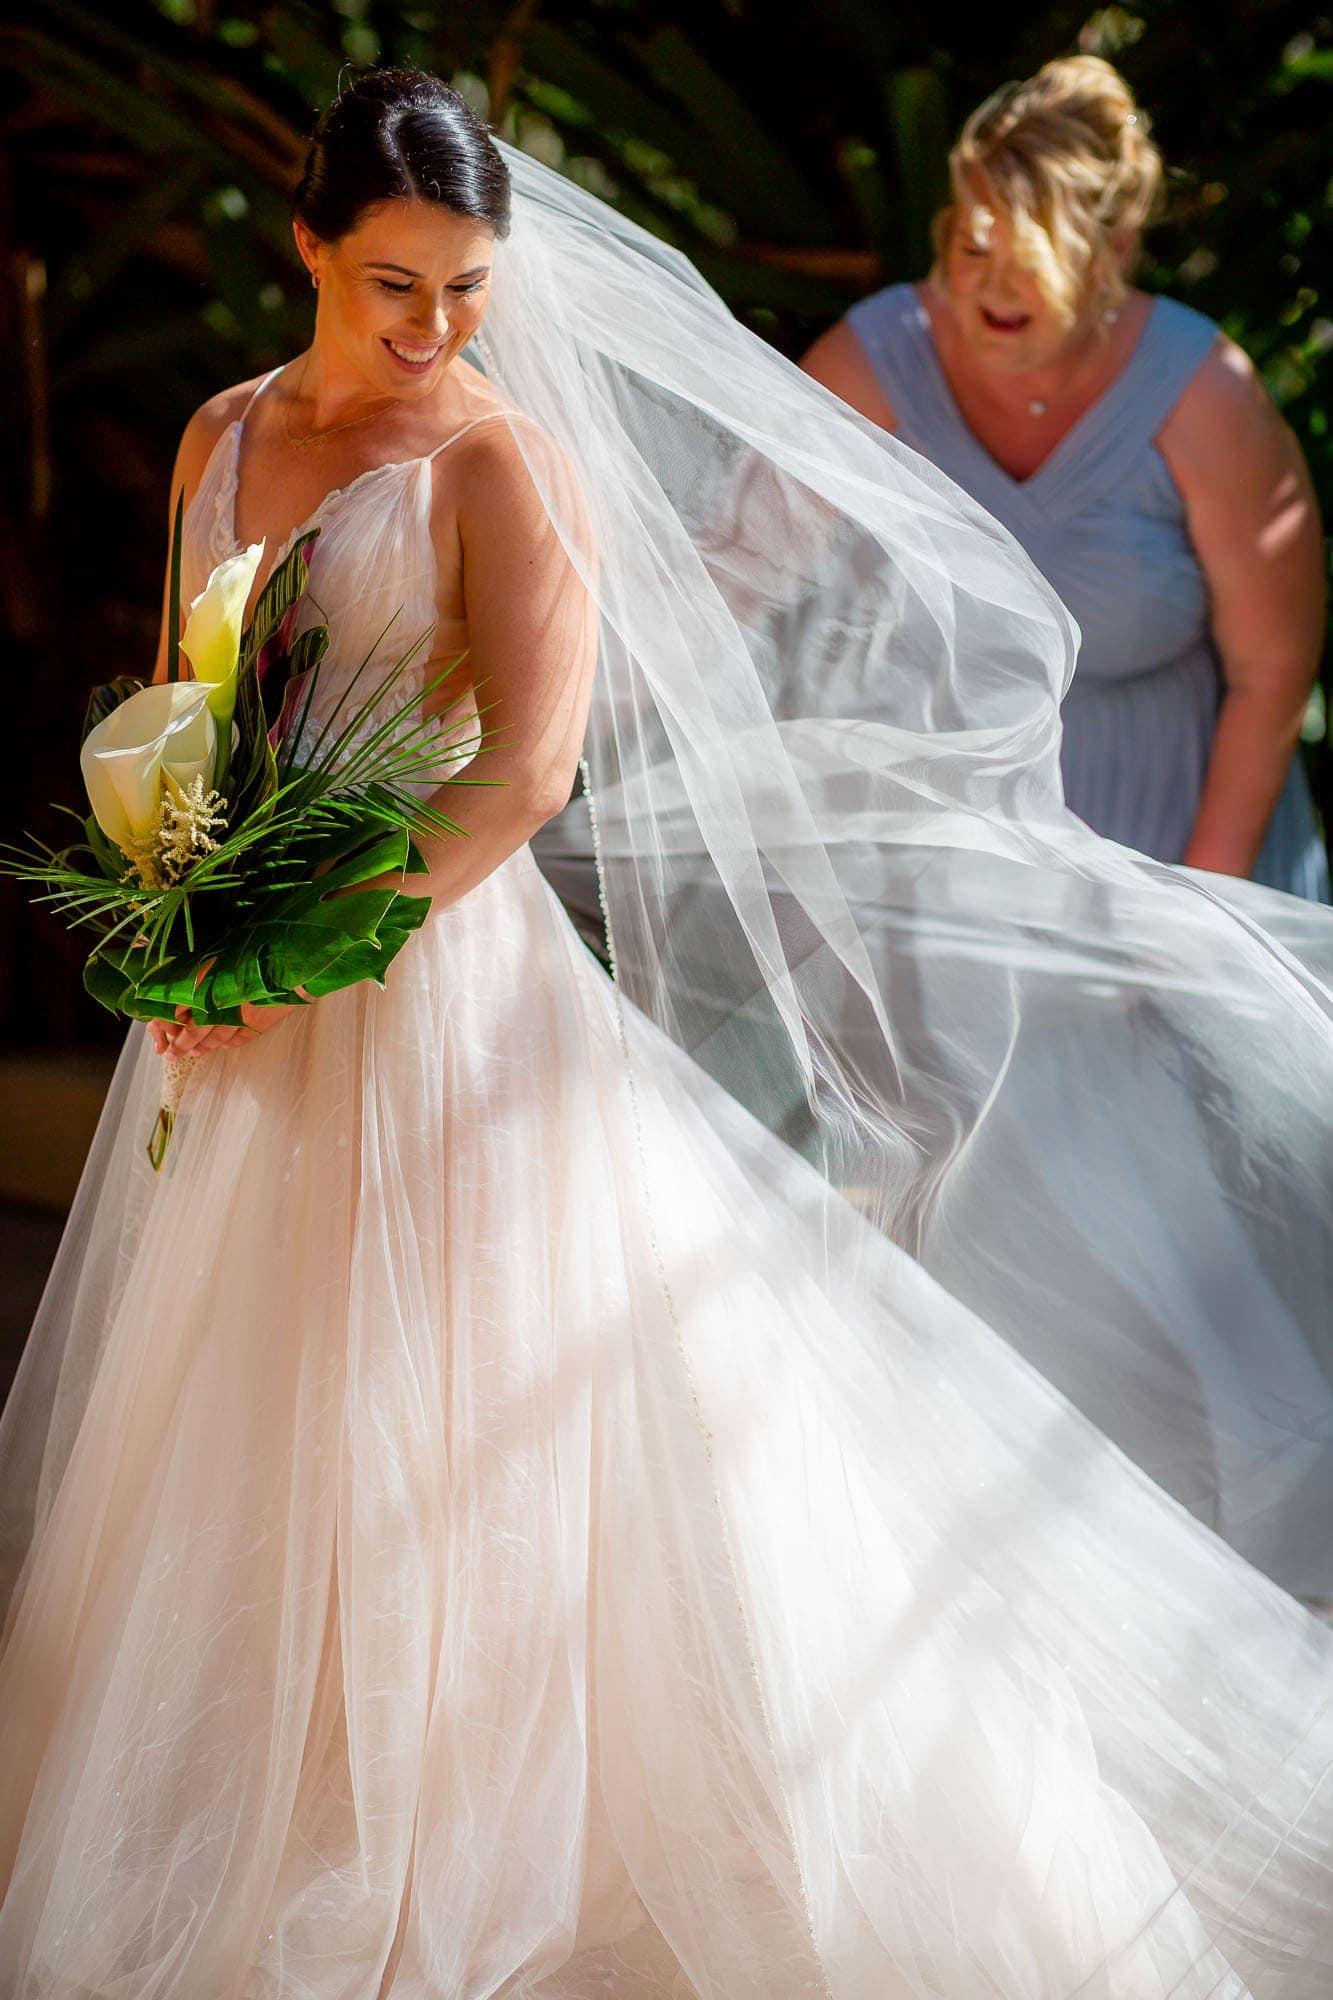 The bride preparing to walk down the aisle